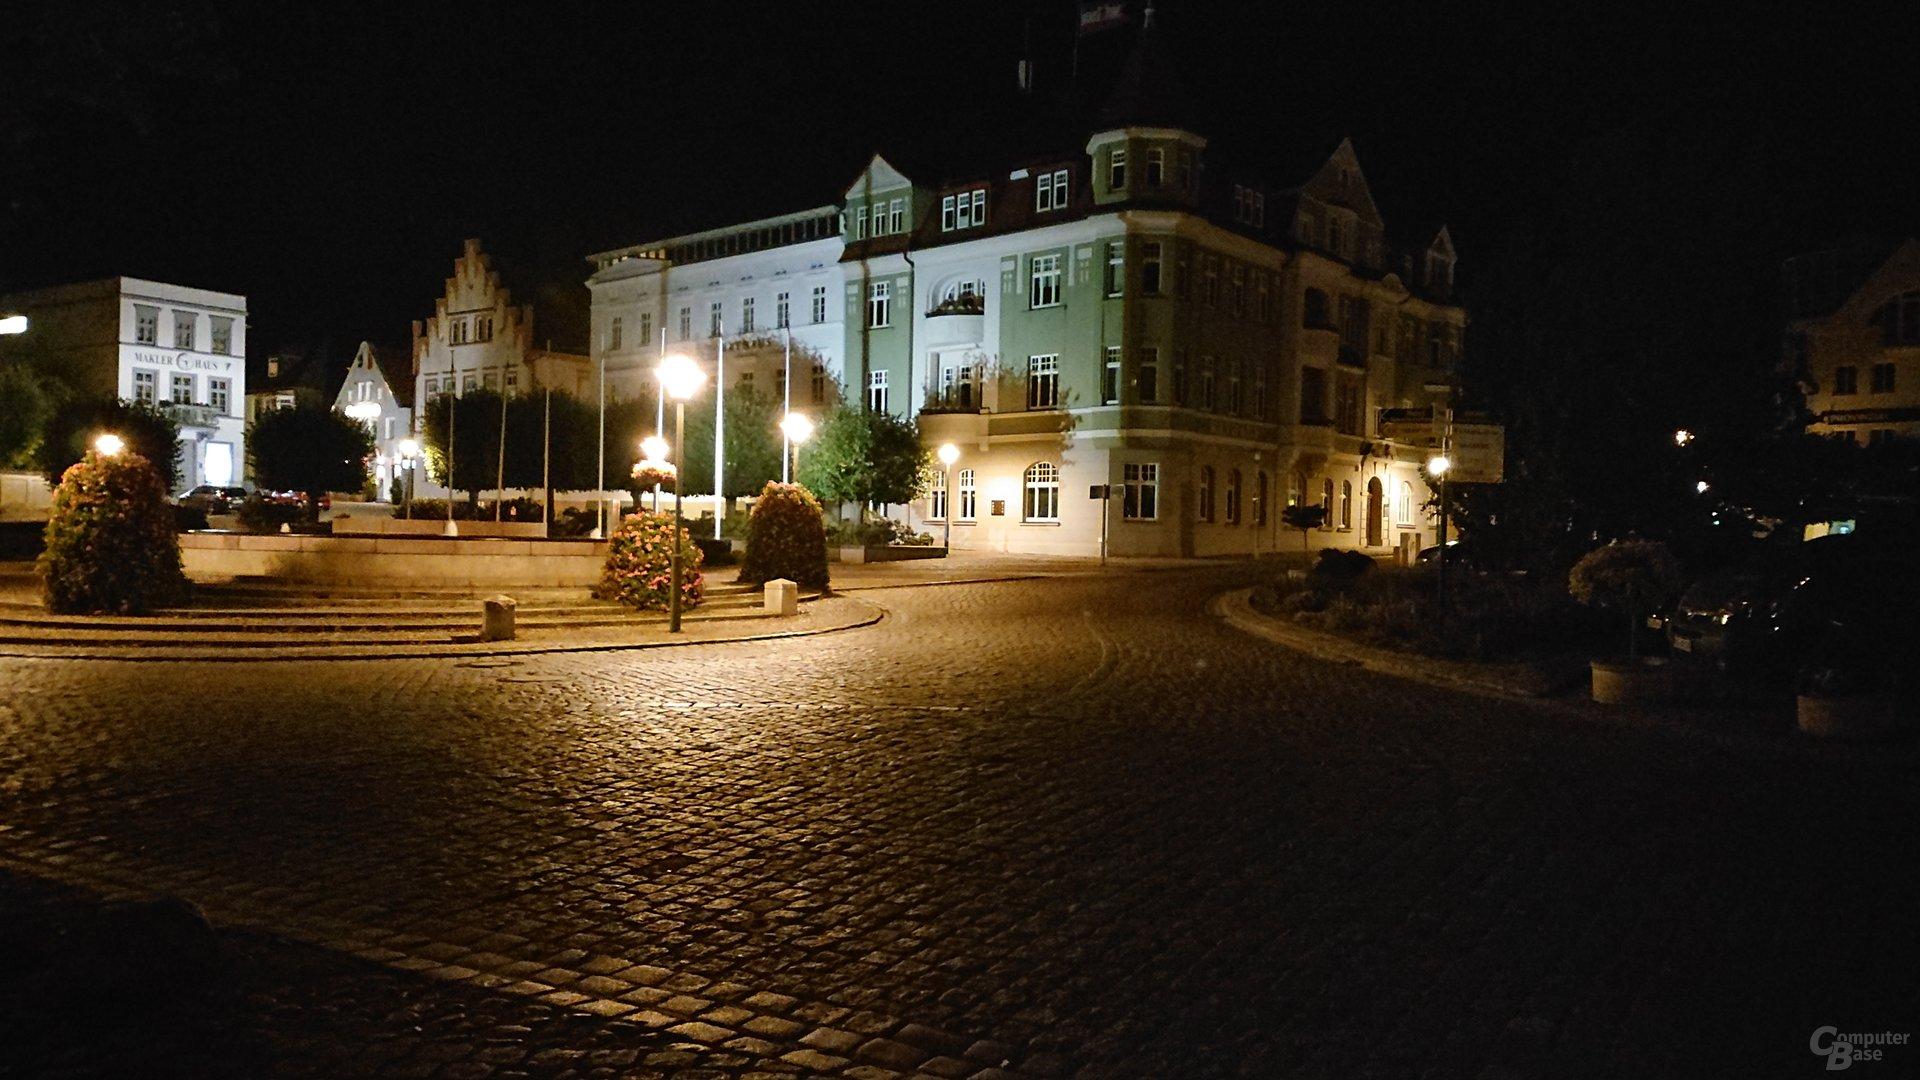 Nachtaufnahme, Duallinse, ISO 12800